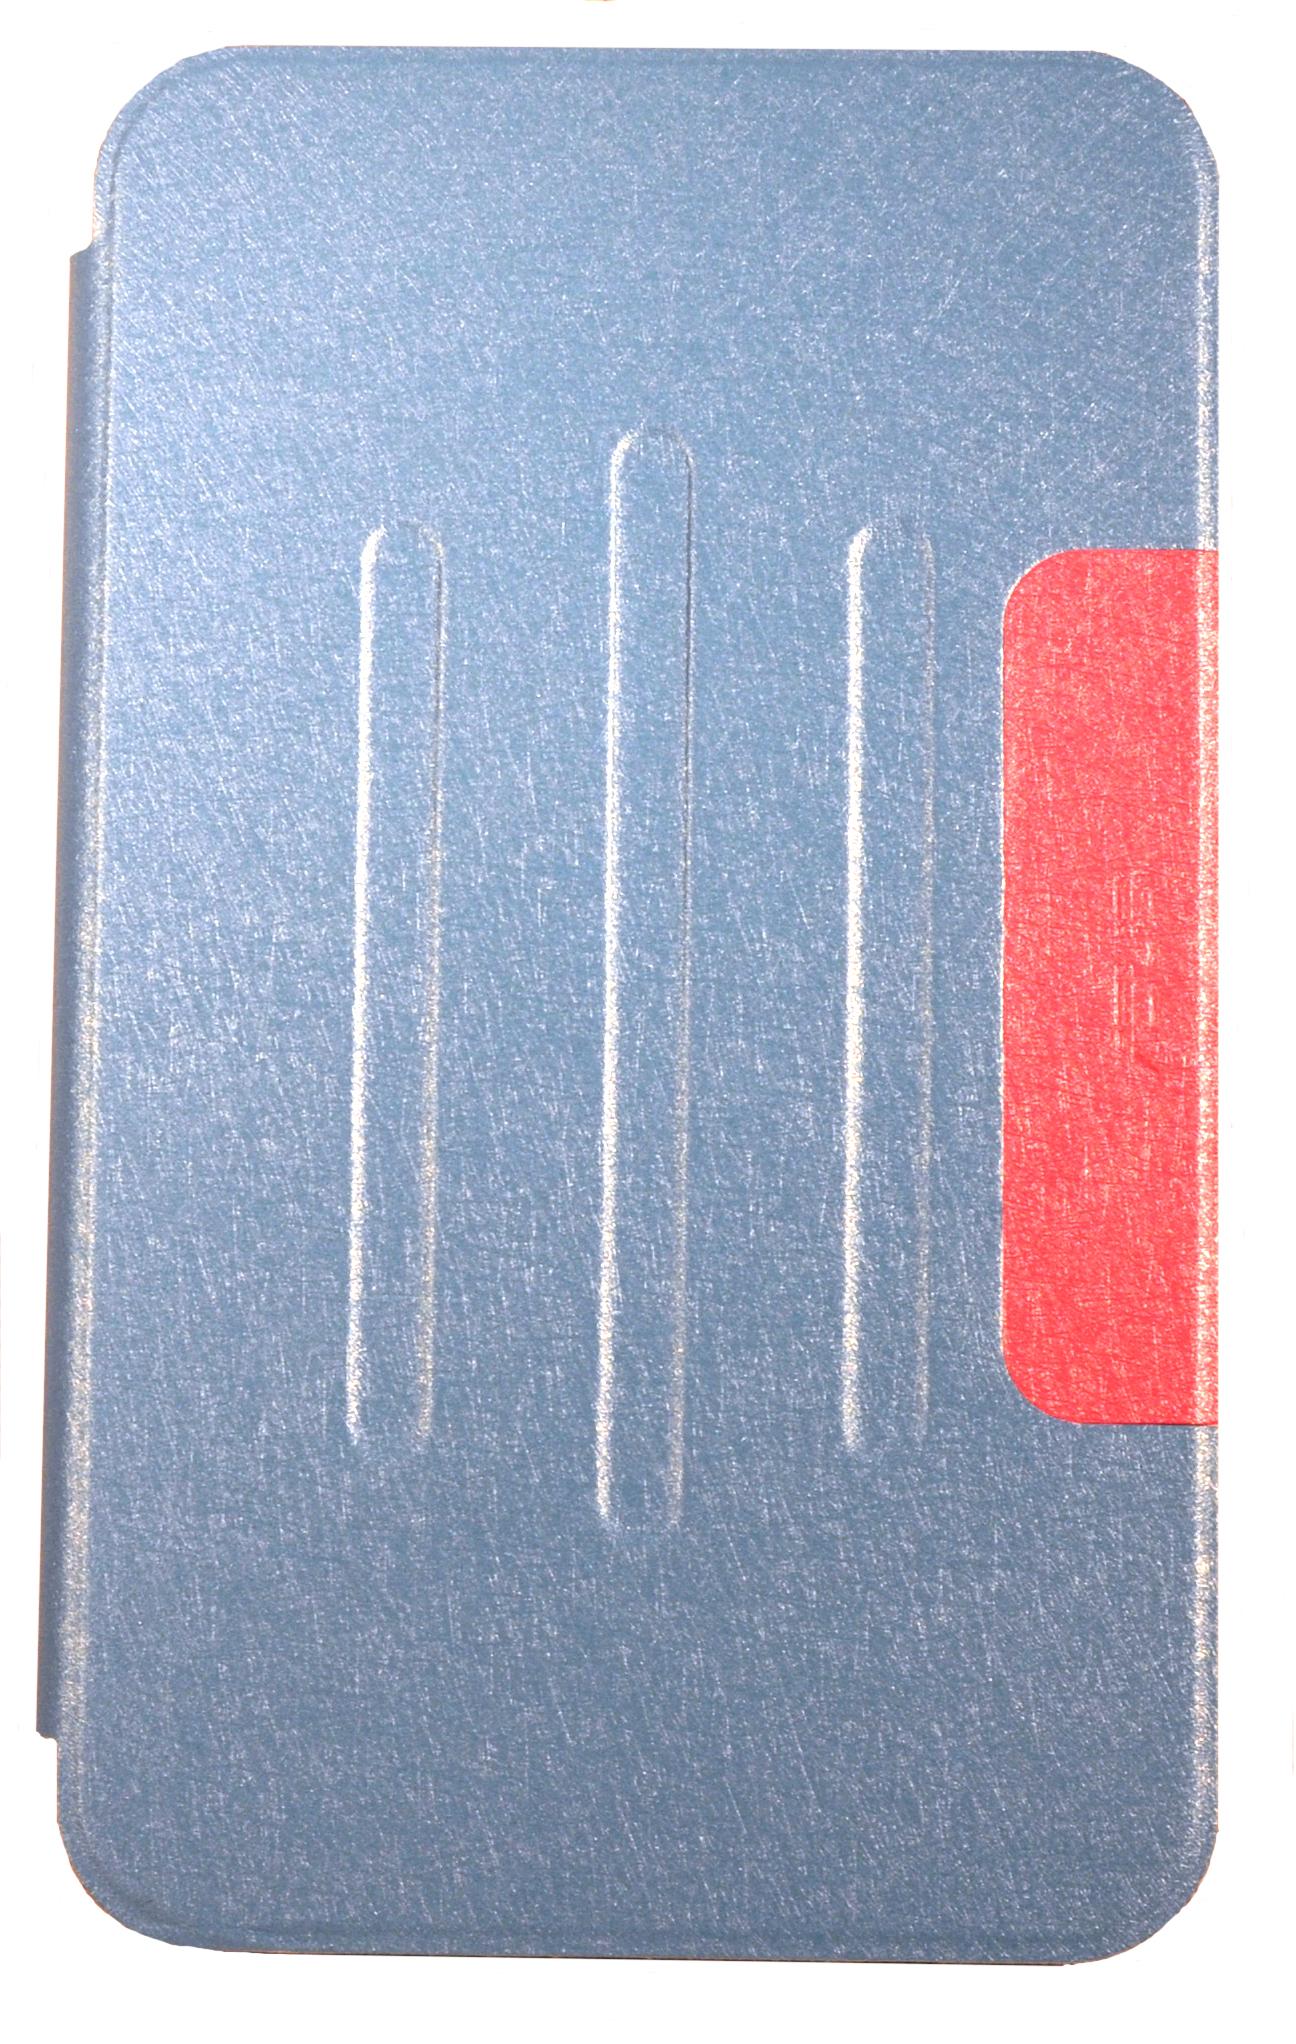 Чехол-книжка Book Cover для ASUS MeMO Pad 8 ME581CL голубой 2000878020795